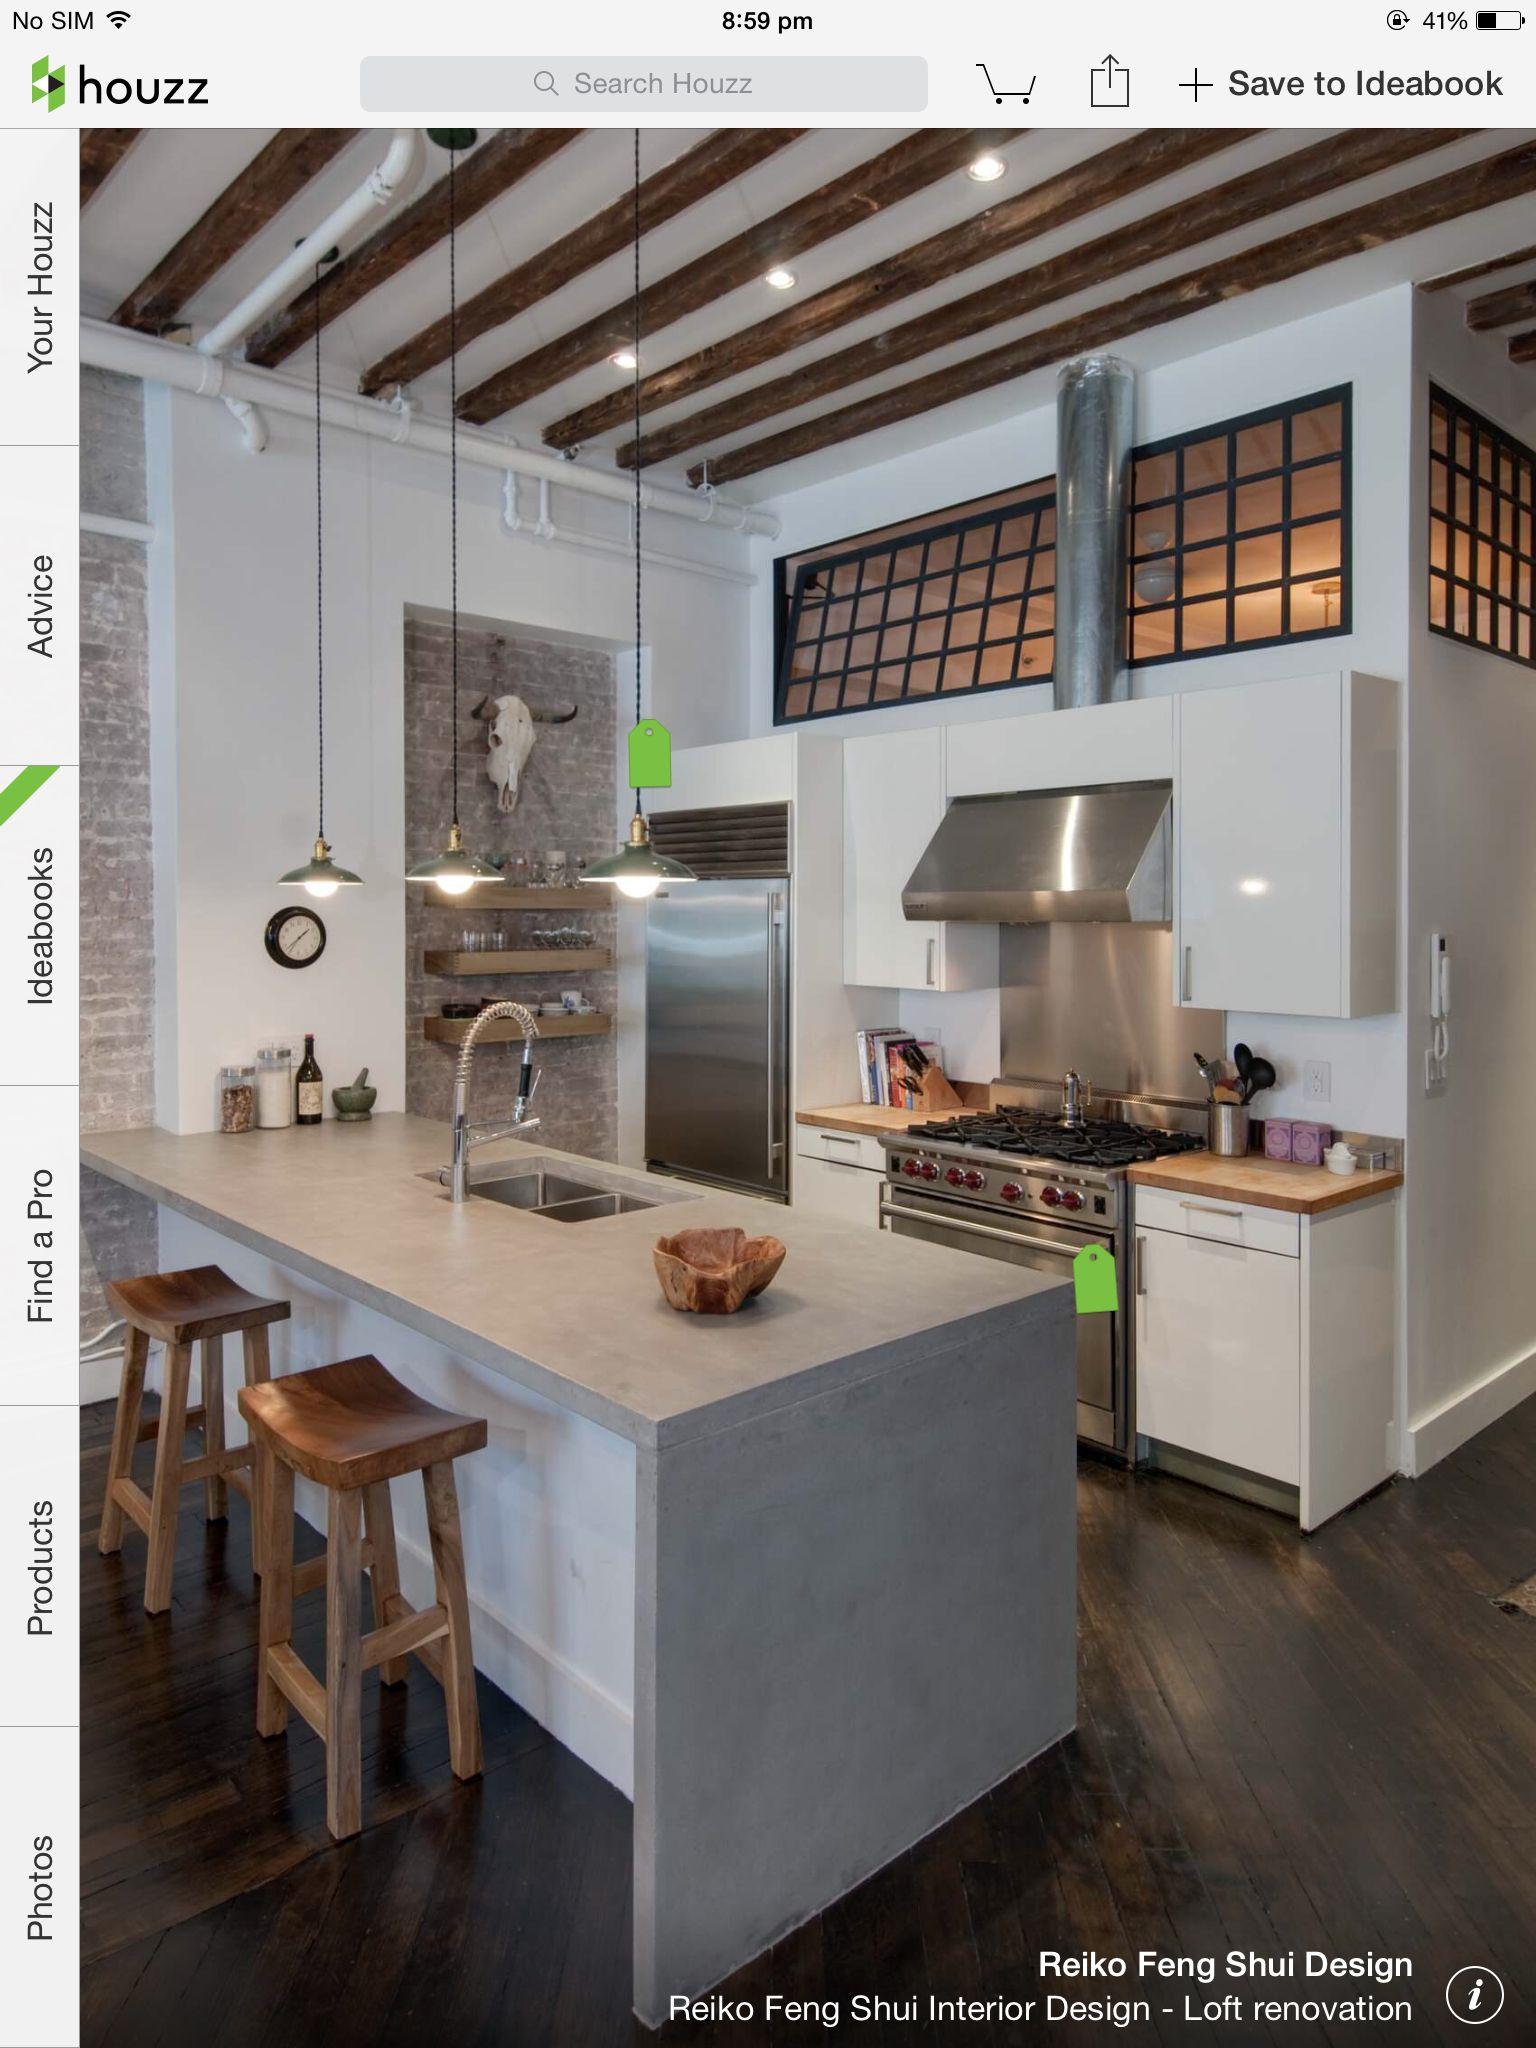 Loft bedroom windows  Loft kitchen with bedroom windows  Amazing apartments  Pinterest